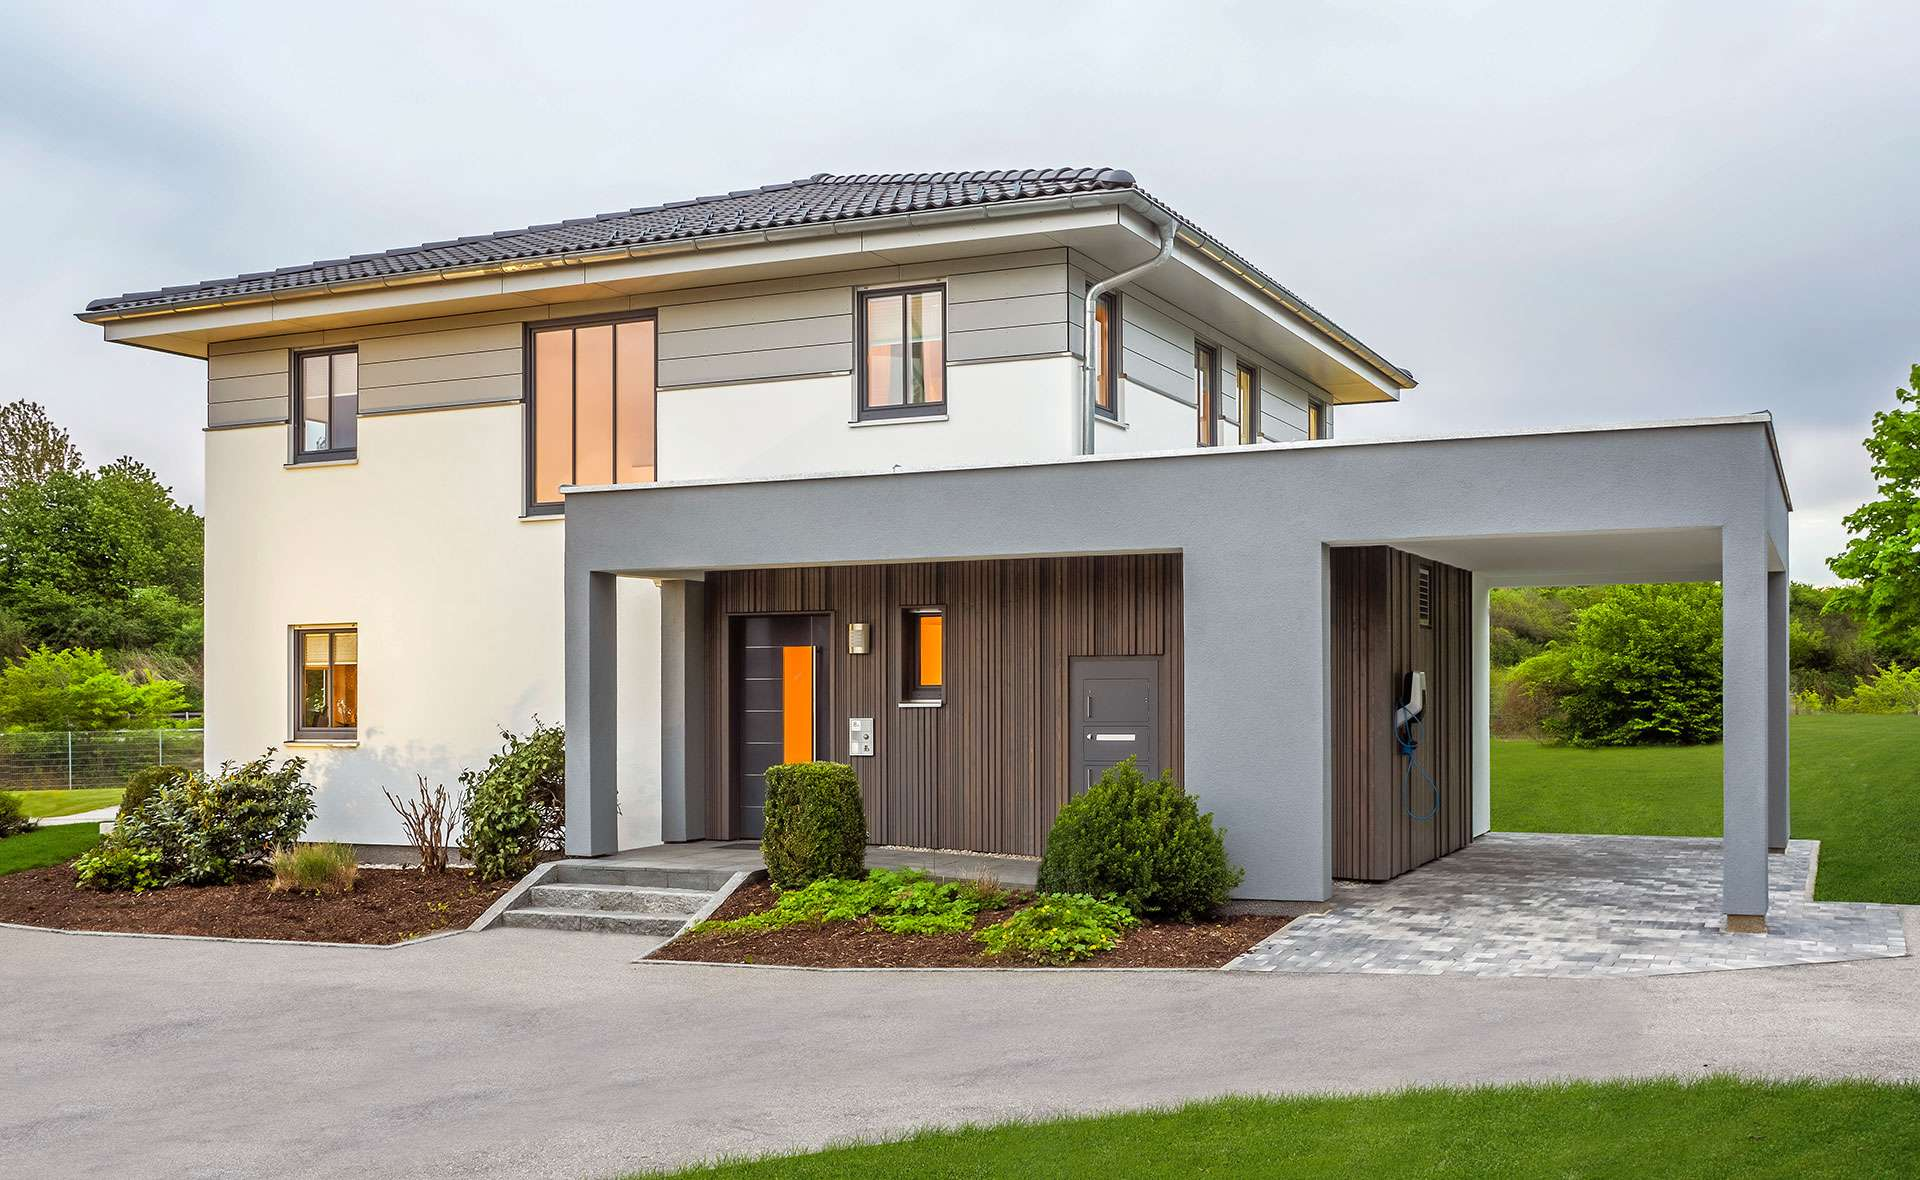 haas fertighaus musterhaus mh falkenberg 150 haas haus. Black Bedroom Furniture Sets. Home Design Ideas